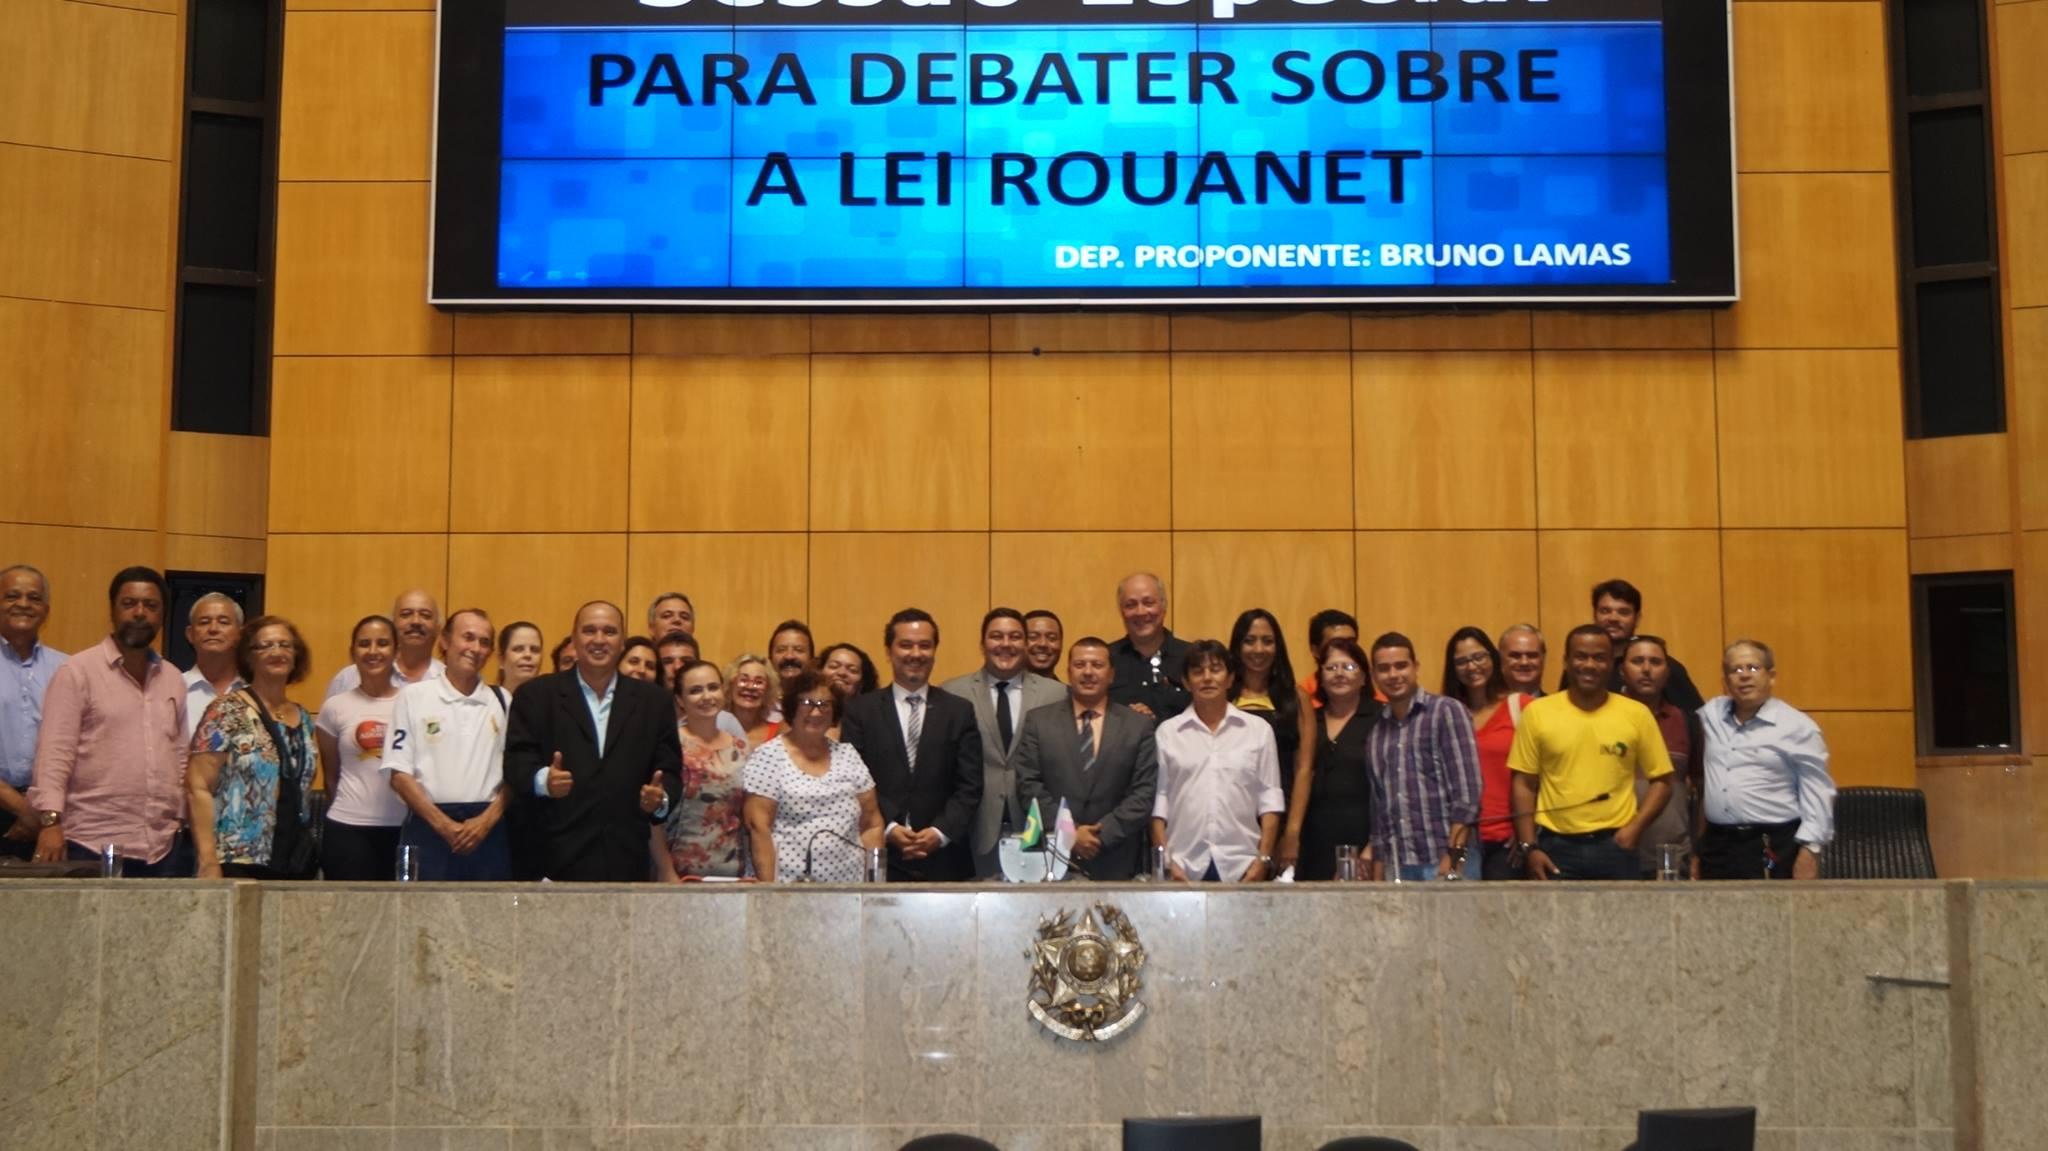 Bruno Lamas debate a Lei Rouanet